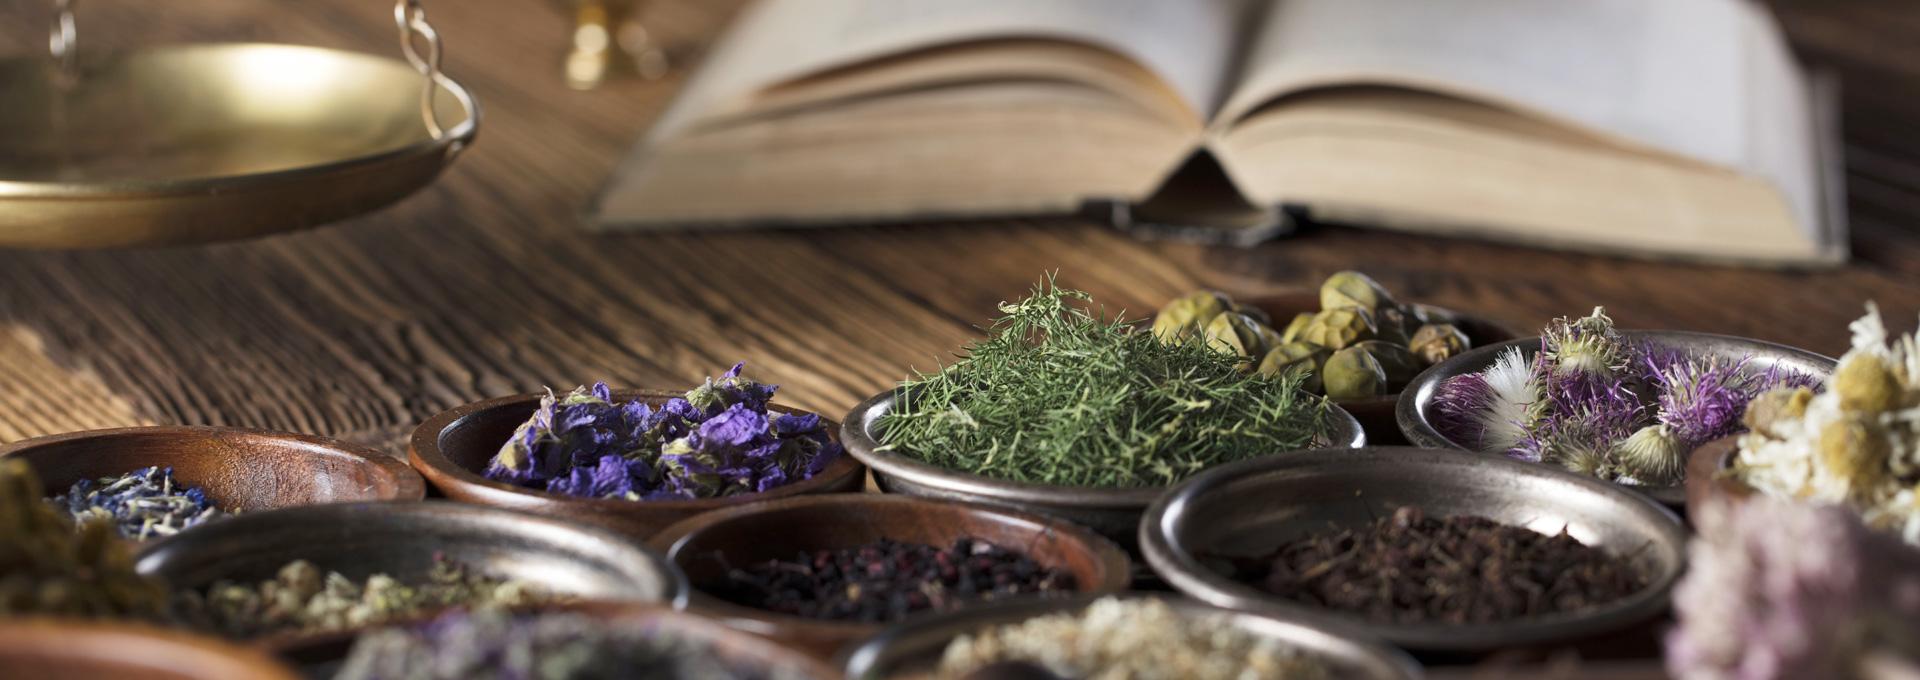 Tee selbst mischen - Online bestellen